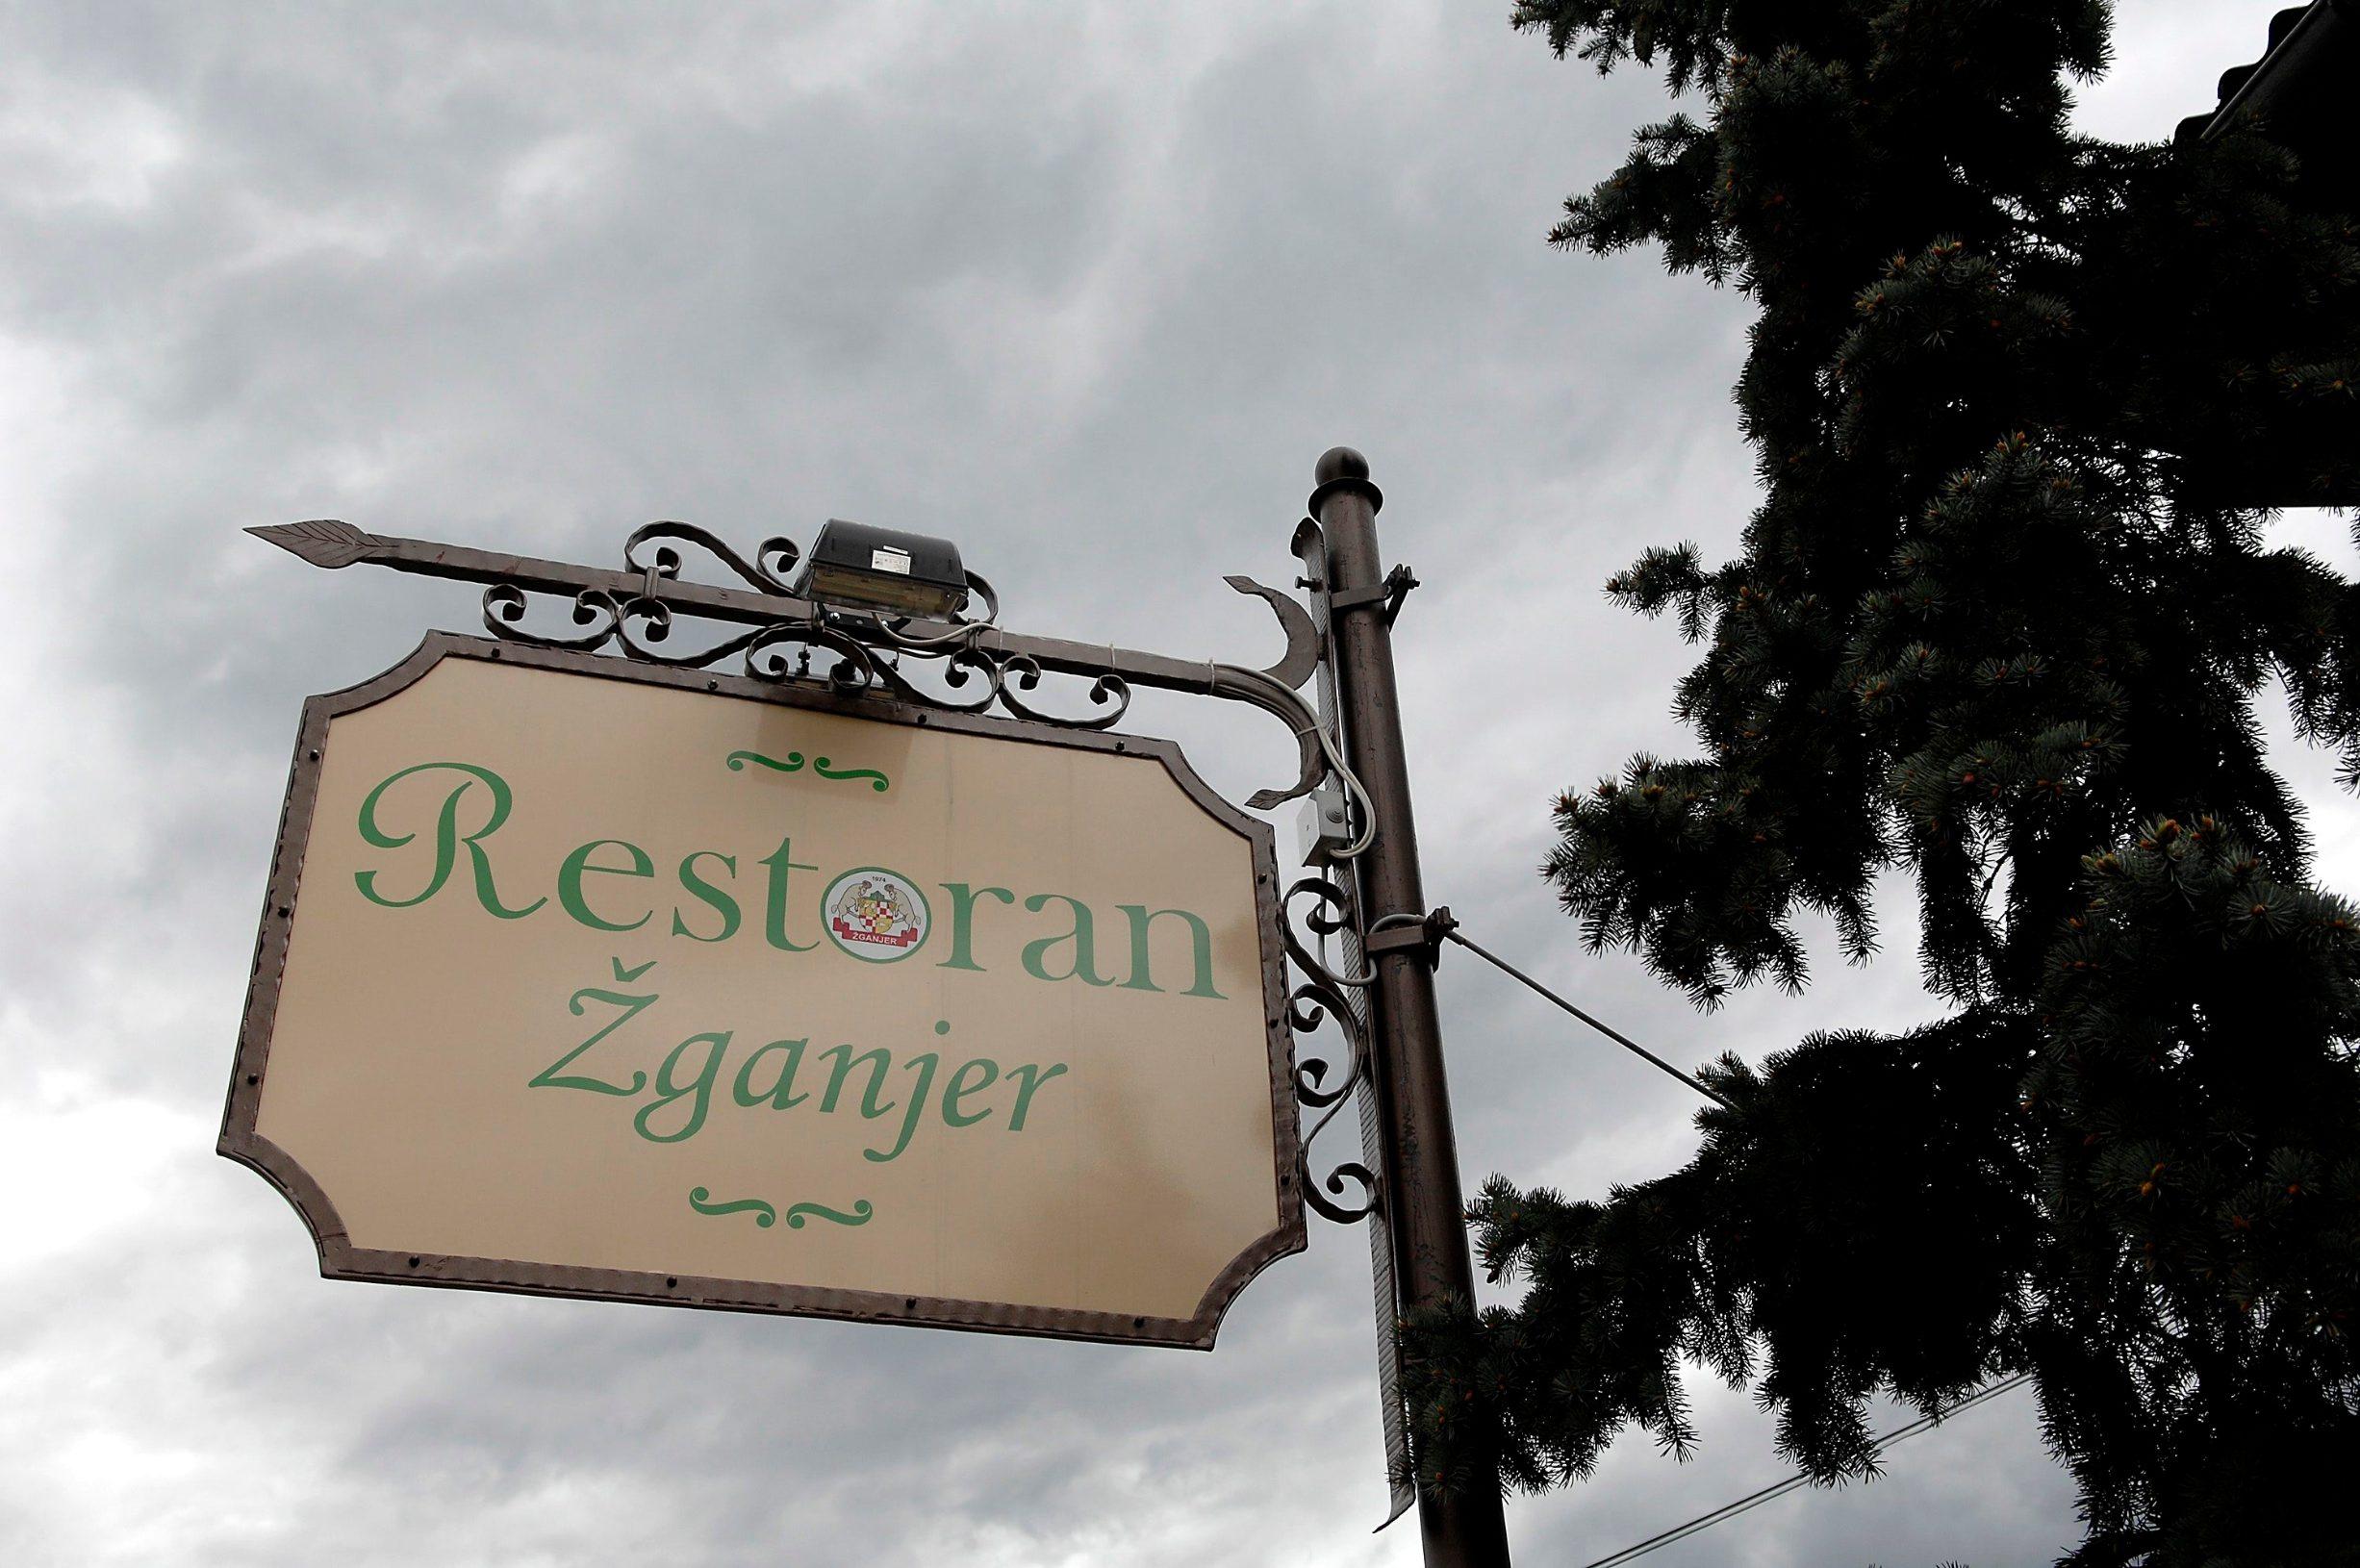 Restoran_Zganjer25-240412